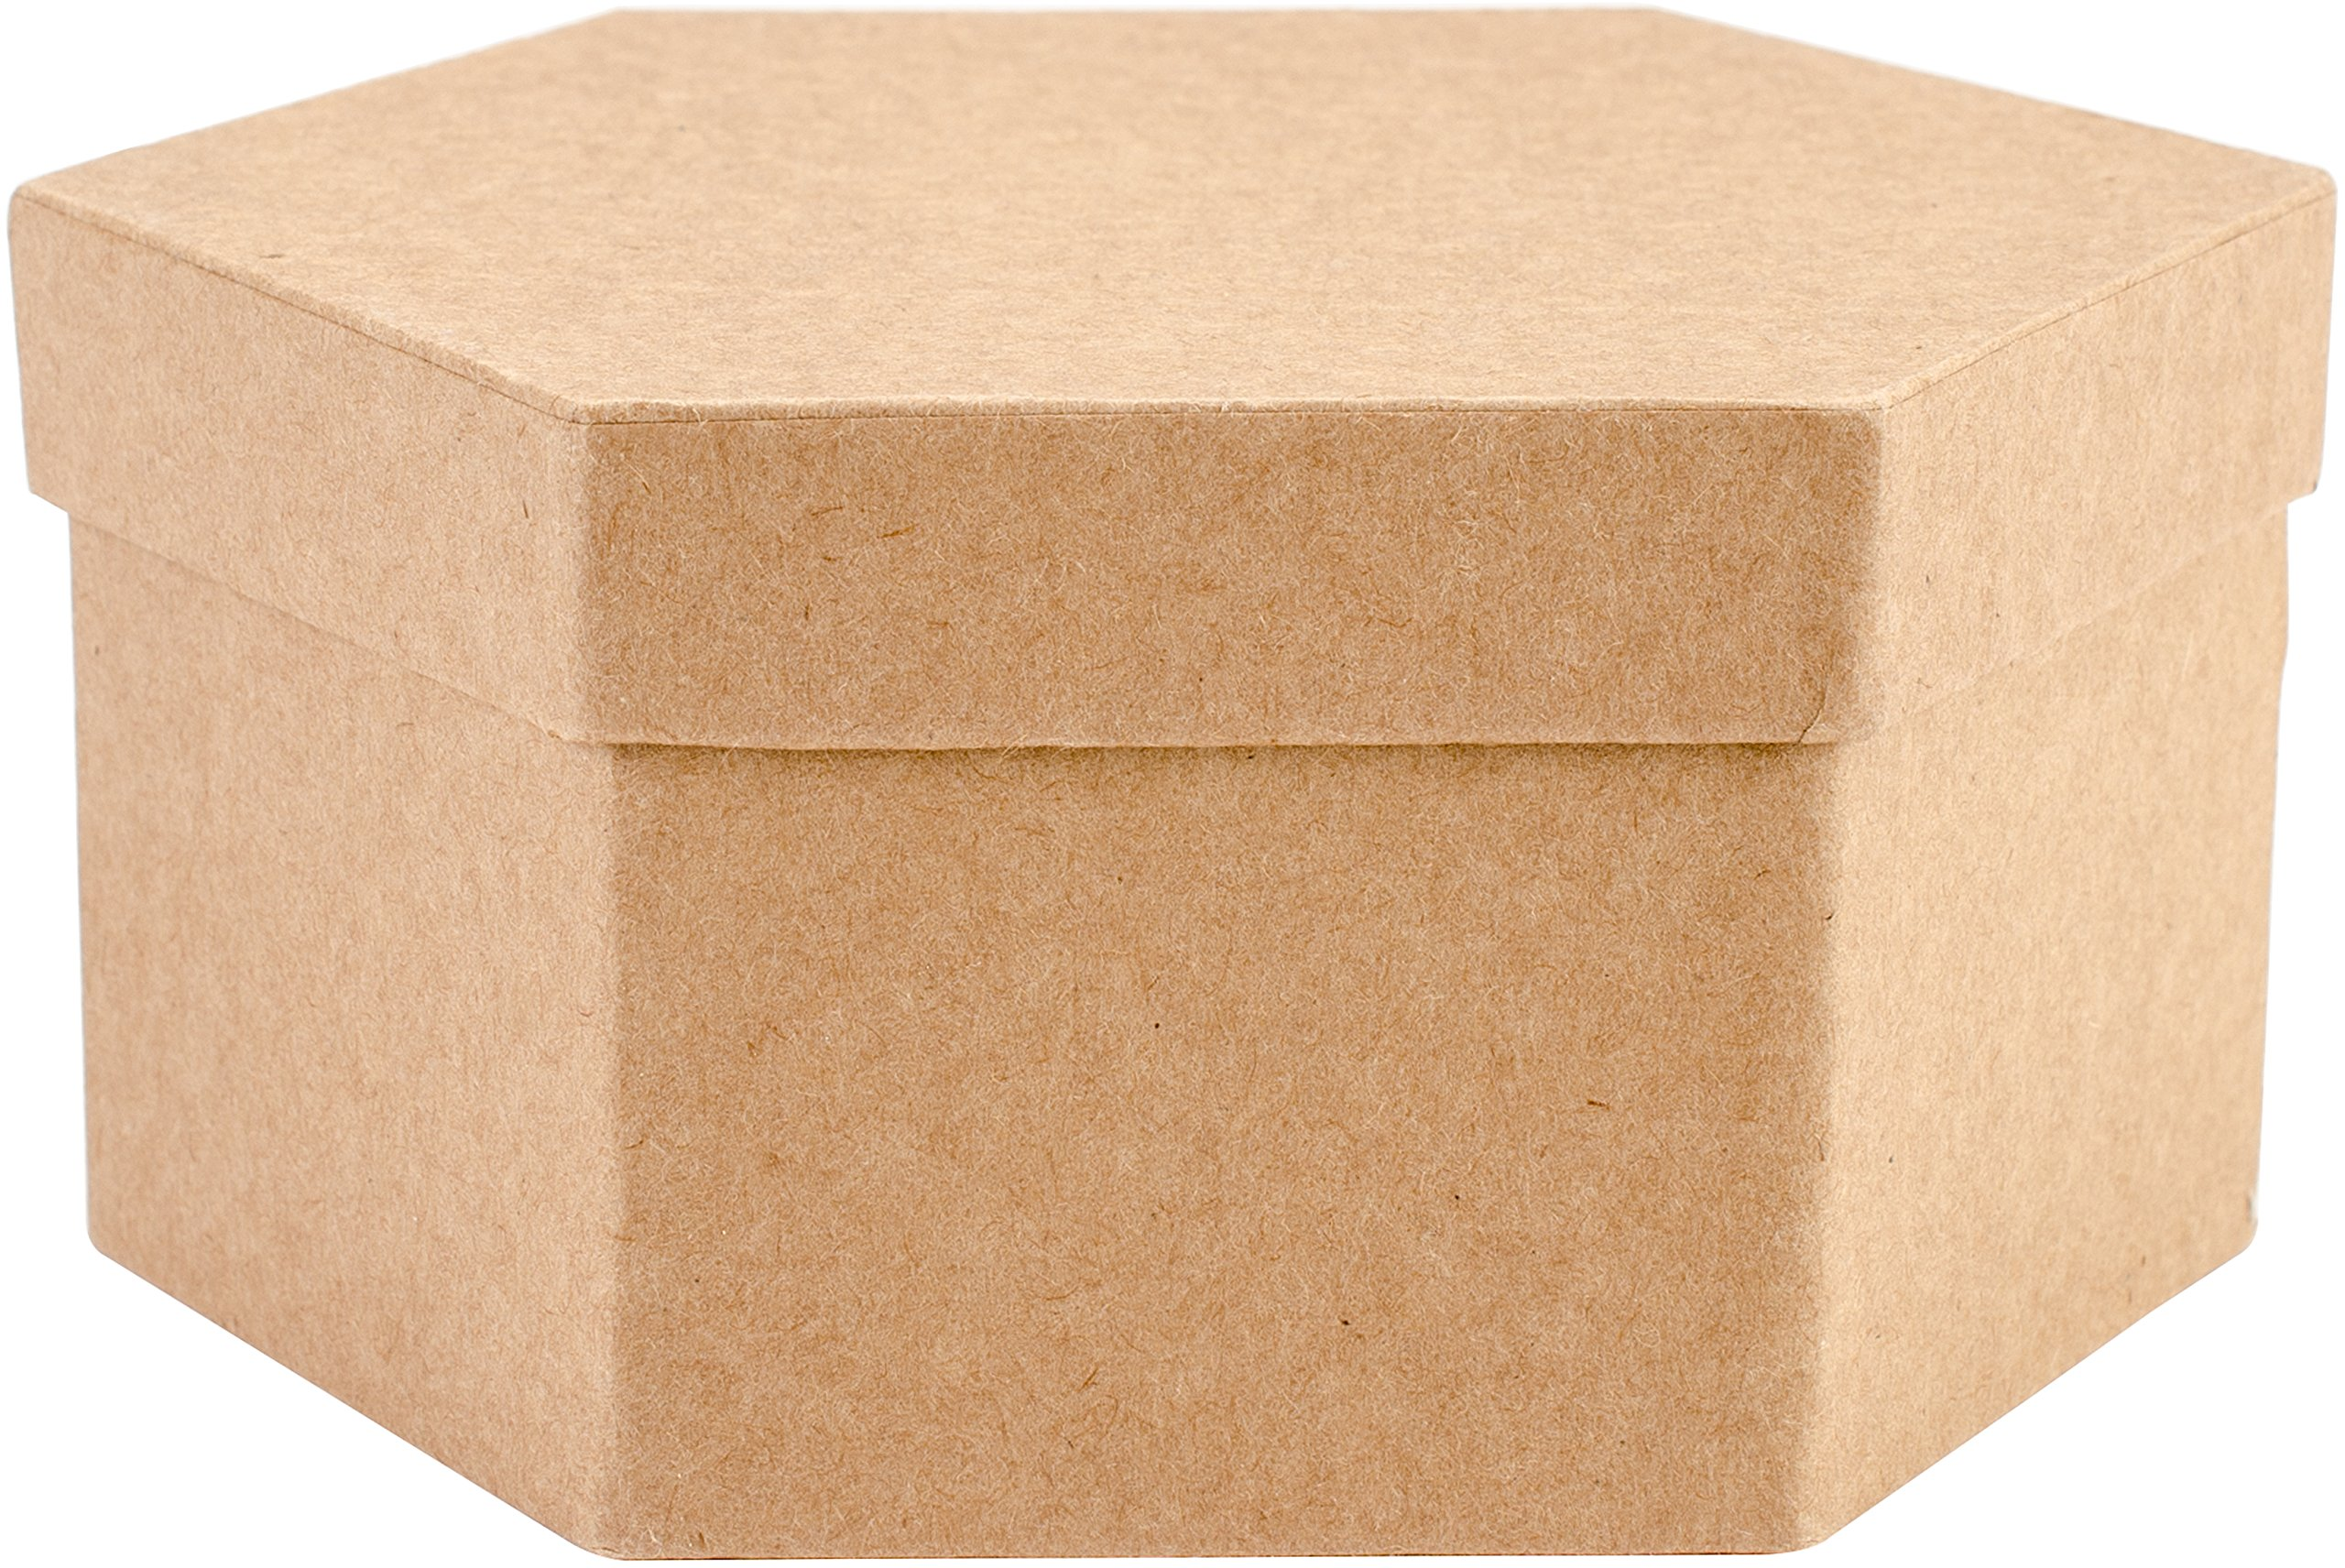 Arte alternativas Paper-Mache Hexagonal Caja Set 5/PKG, Multicolor, 15,24 x 14.73 x 7.11 cm: Amazon.es: Hogar